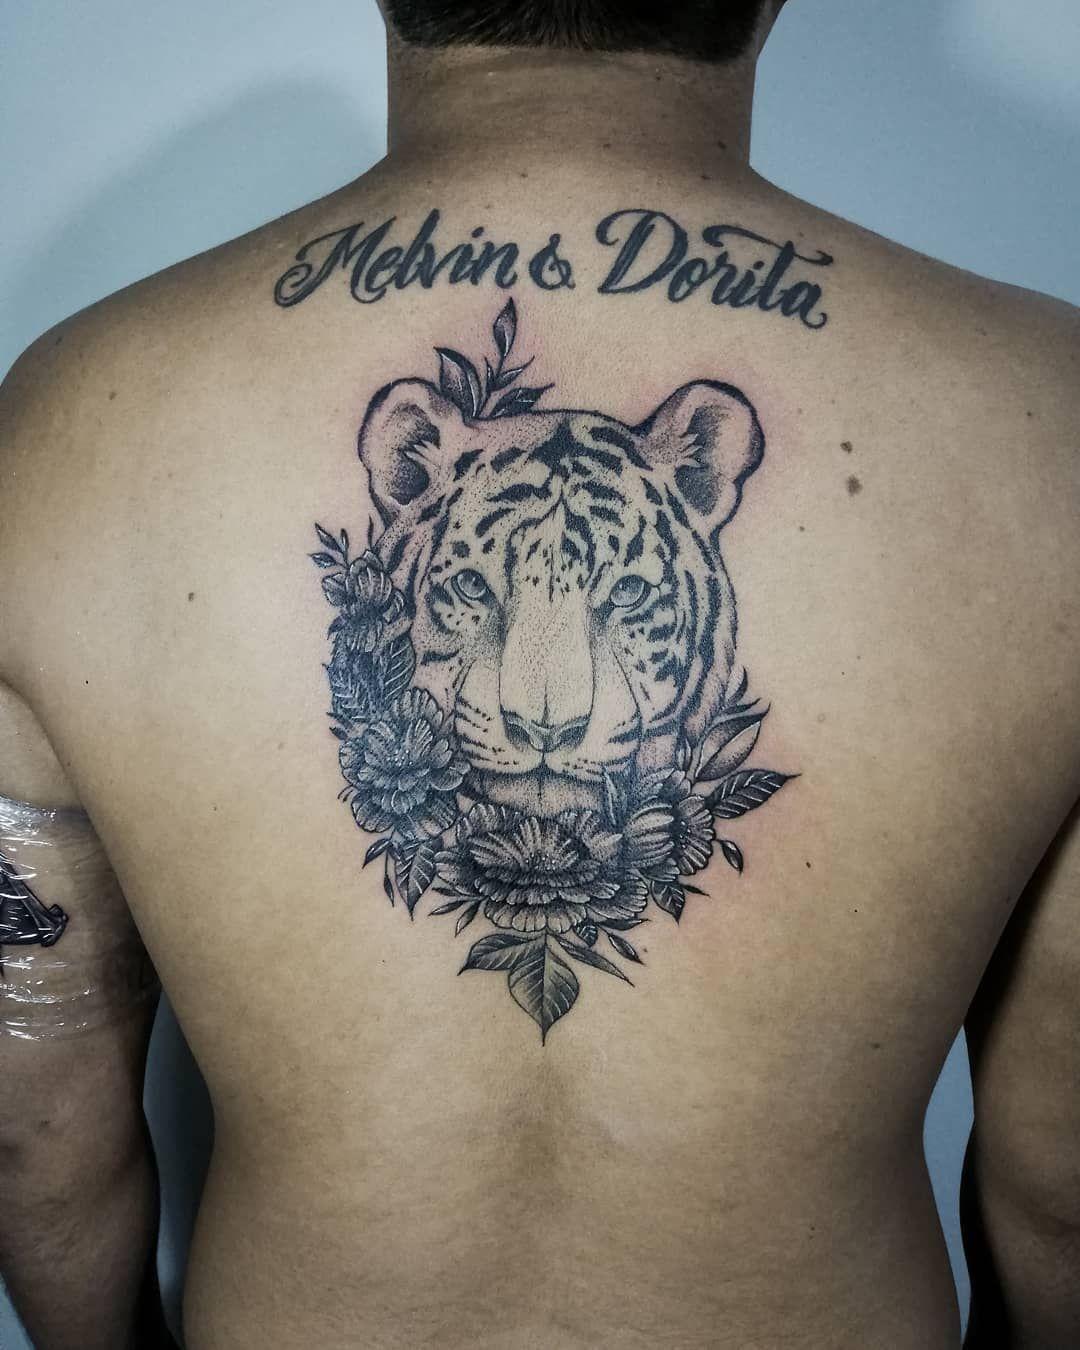 ❌Tigre❌  Espero les guste ✌️💀 Para alguna consulta, presupuesto o separar una cita pueden dejarme un mensaje al inbox o al WhatsApp 955835575 📲 (No llamadas) × × × × ×  #tattooart #koitattoo #happytattoo #perutattoo #peruart #peruvianart #peruvianartist #ink #tattoo #tarapoto  #eternalink #letteringtattoo #orientaltattoo #wordingtattodesign #tatuajes #tattooartwork #linework #blackworktattoo #biotattoo #biomecanico #mechanictattoo #blacktattooworlds #blackandwhite  #blackandgrey #blackangrey #